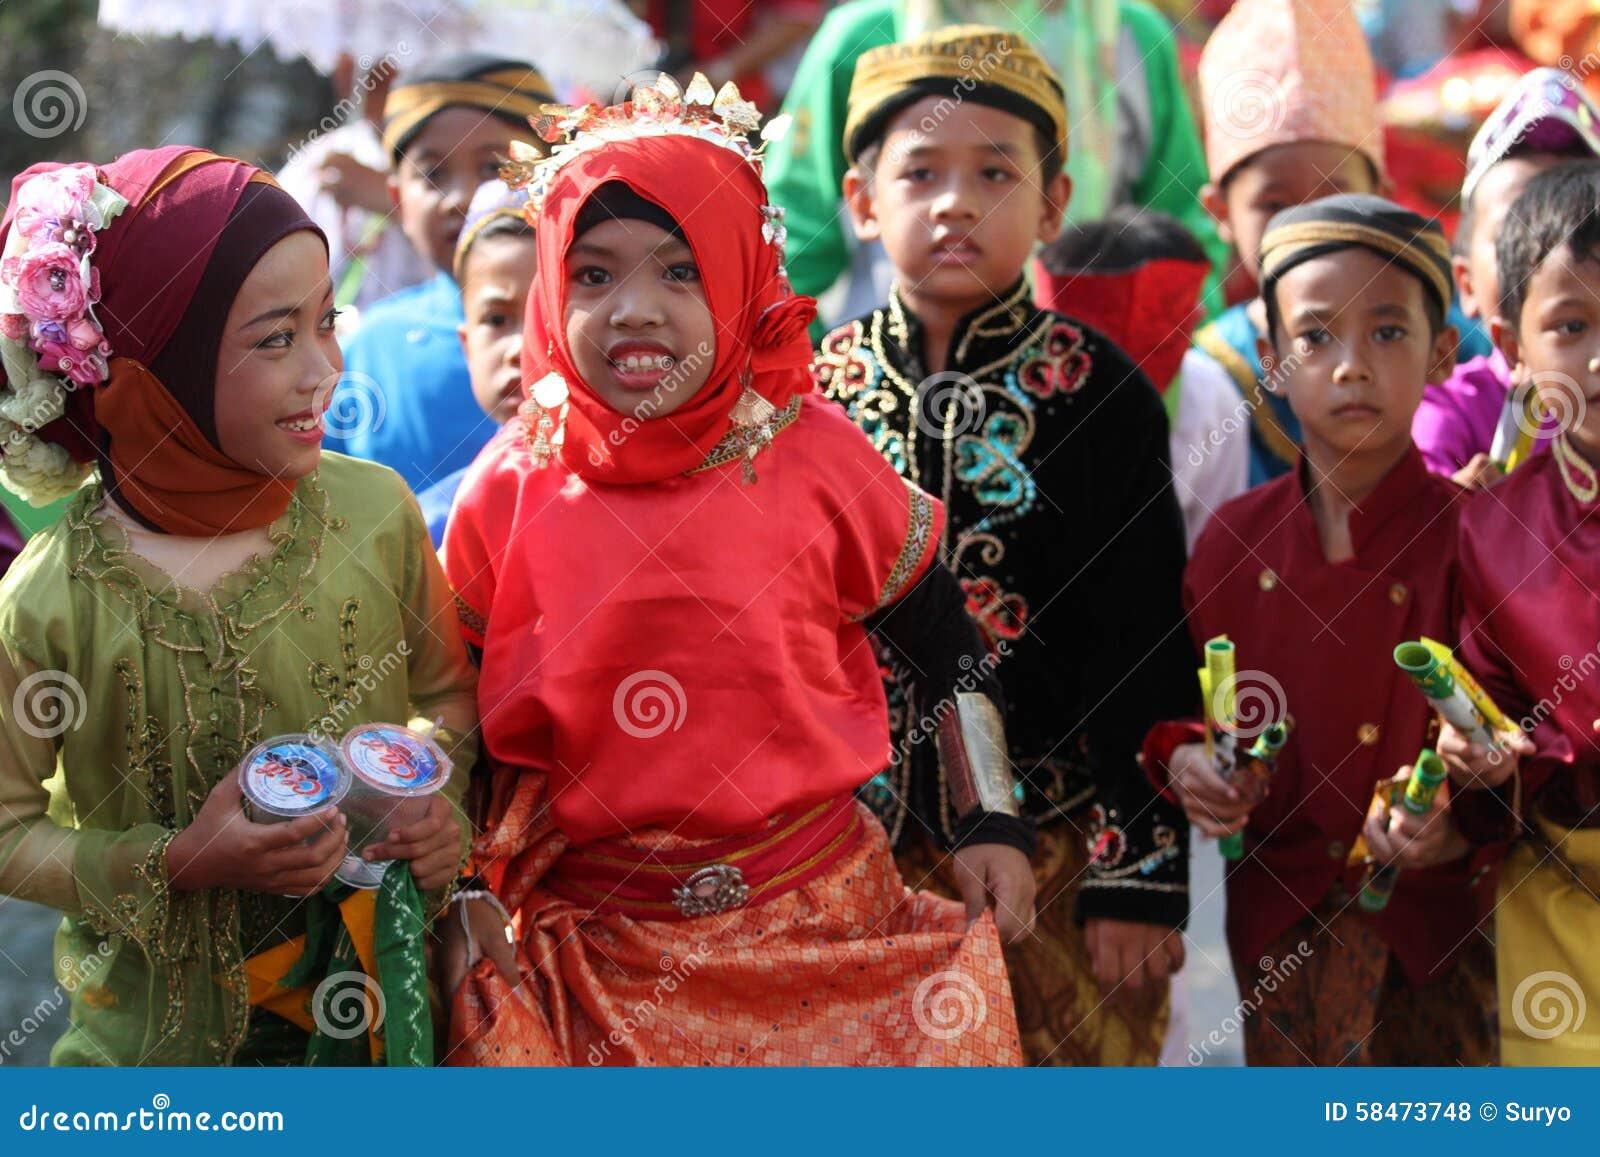 Cultural parade Editorial Stock Photo